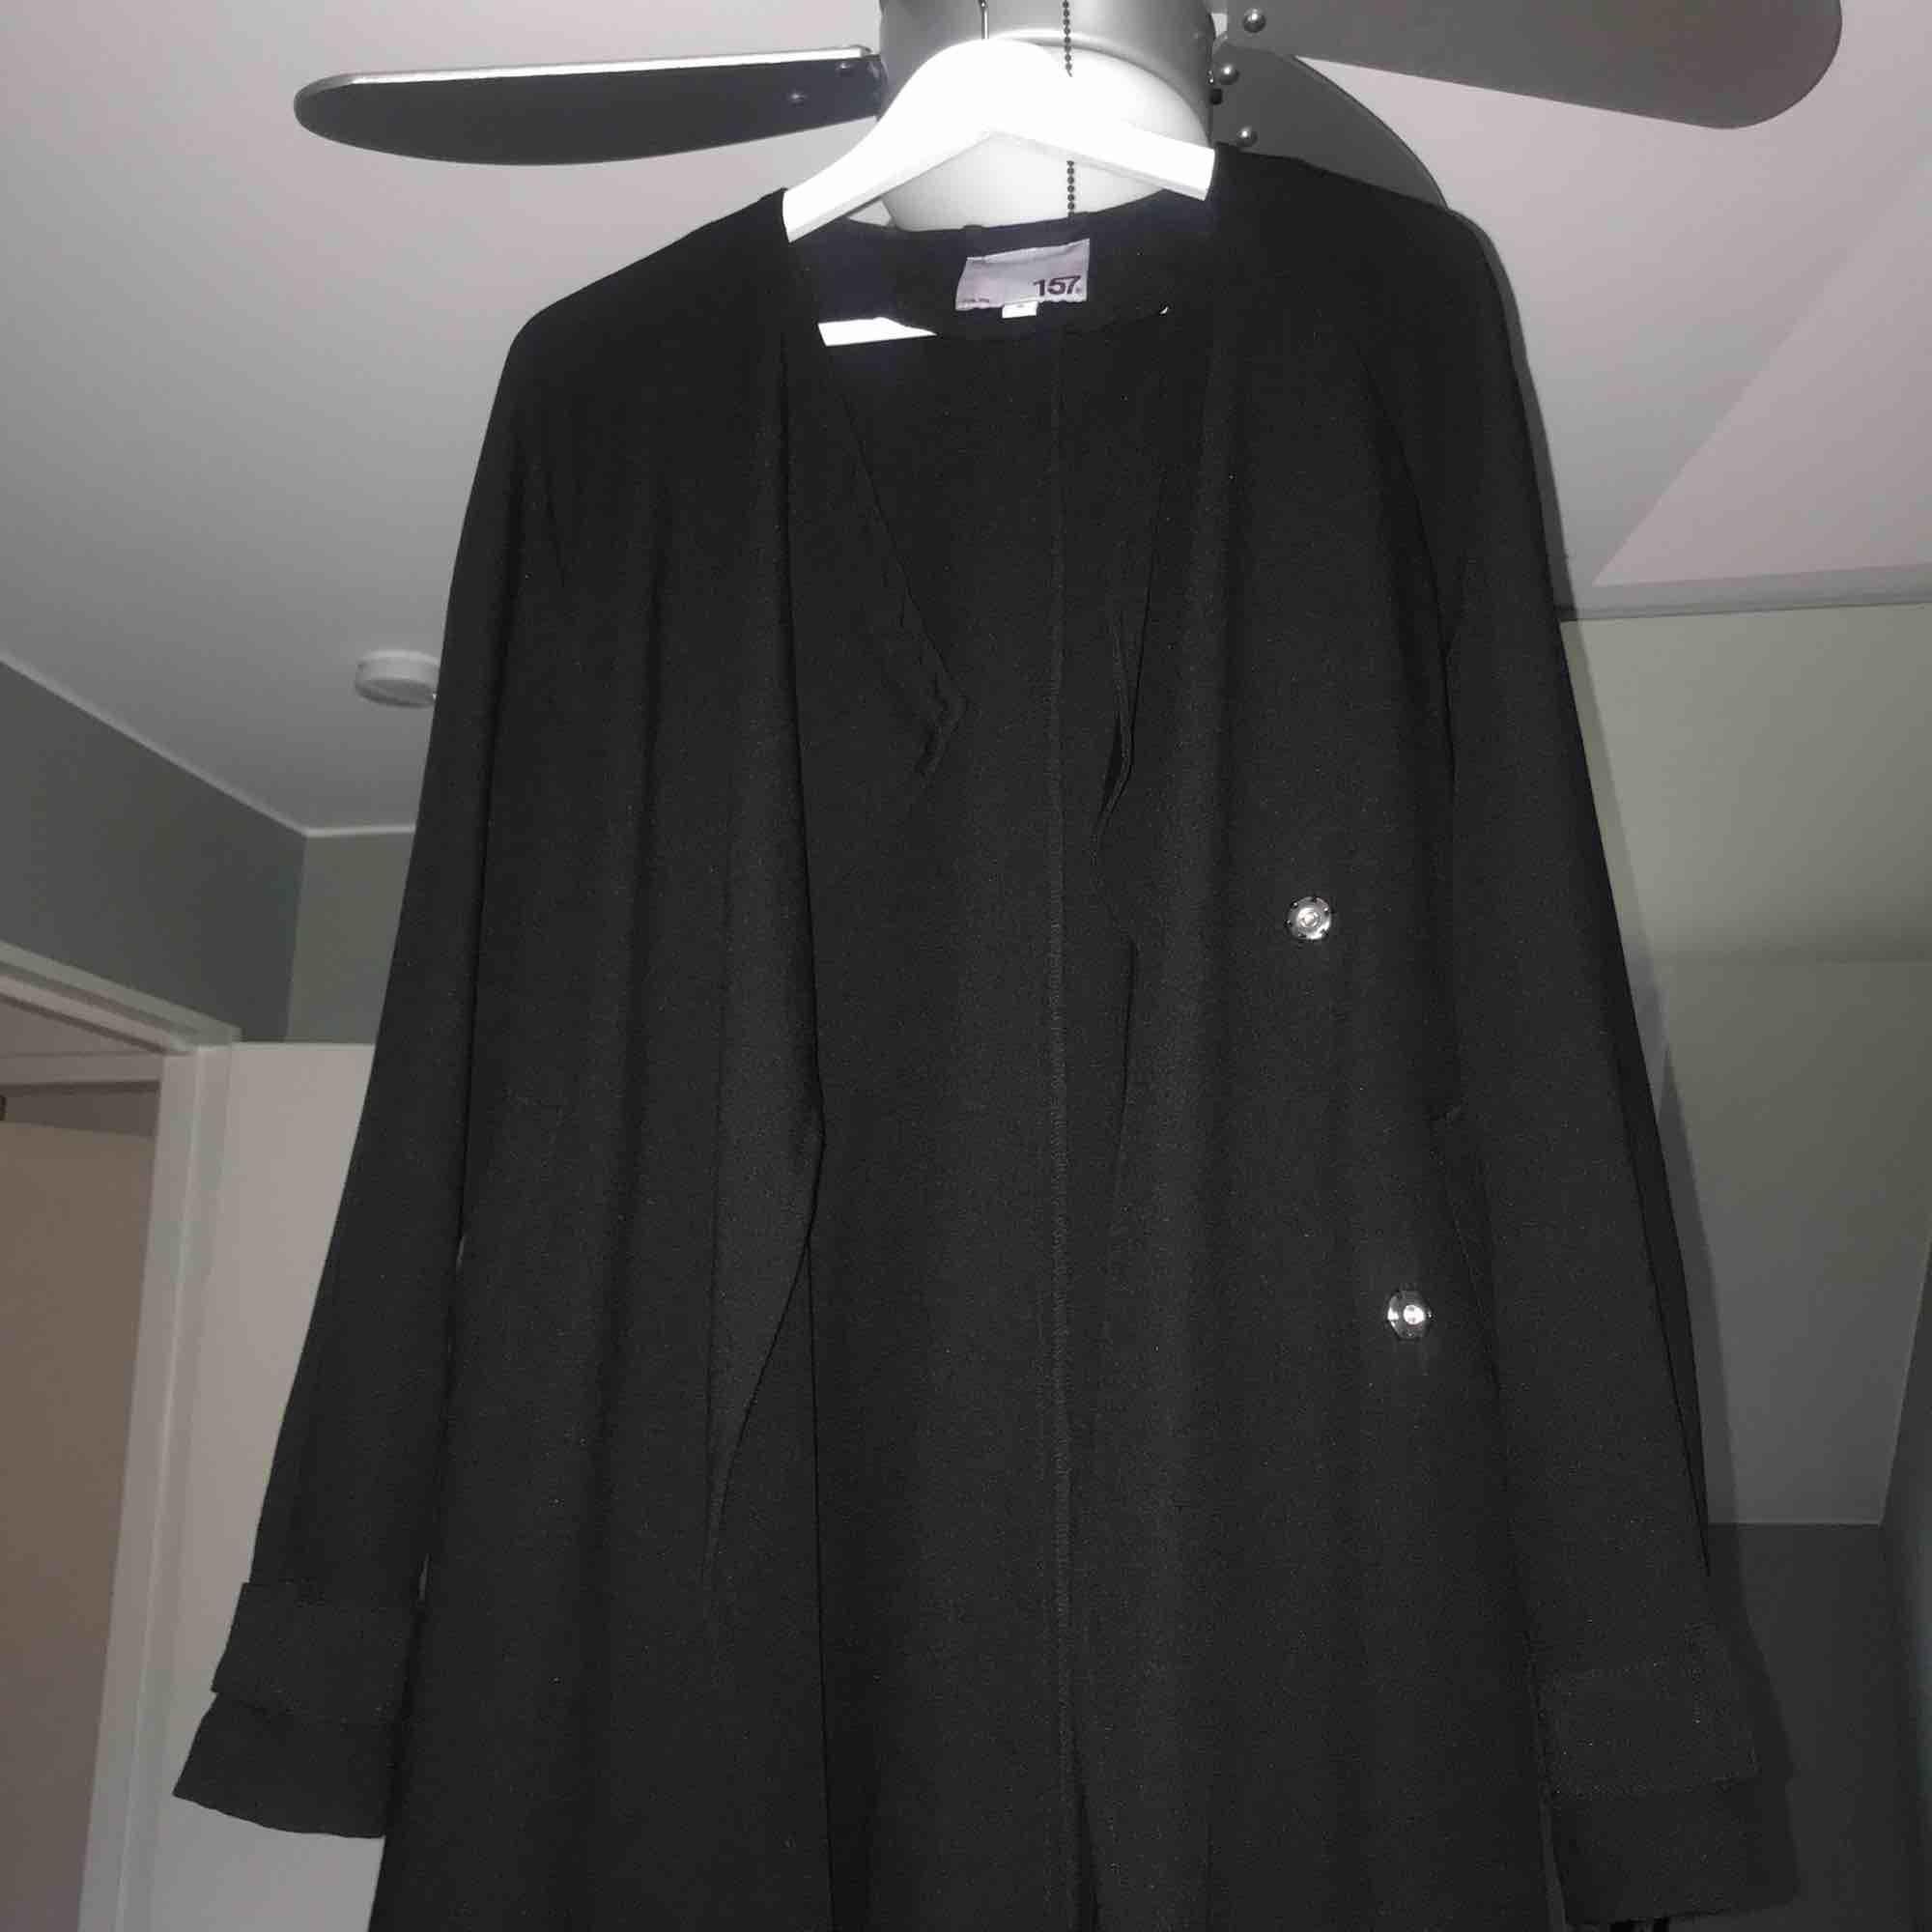 Svart enkel trench coat från lager 157. Jackor.